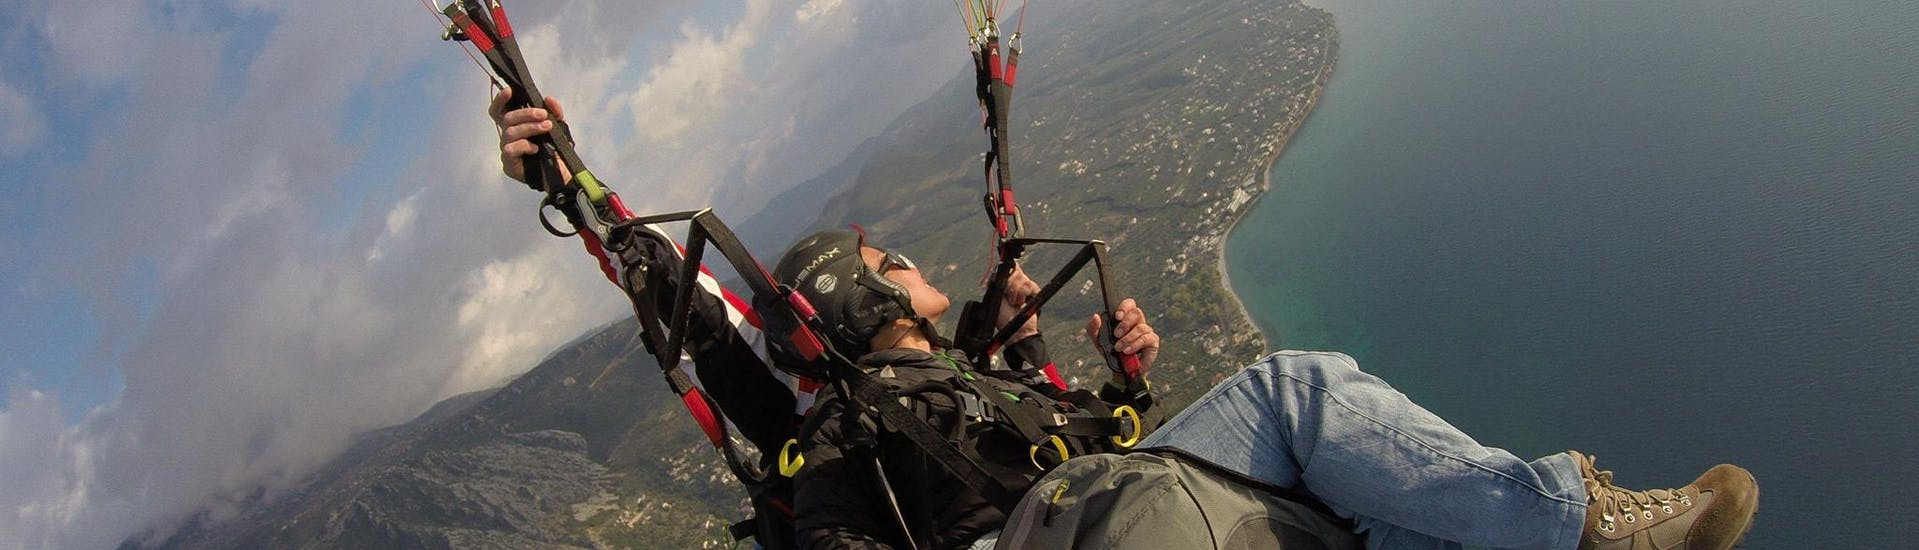 tandem-paragliding-long-flight-in-winter-athens-O2-paragliding-hero